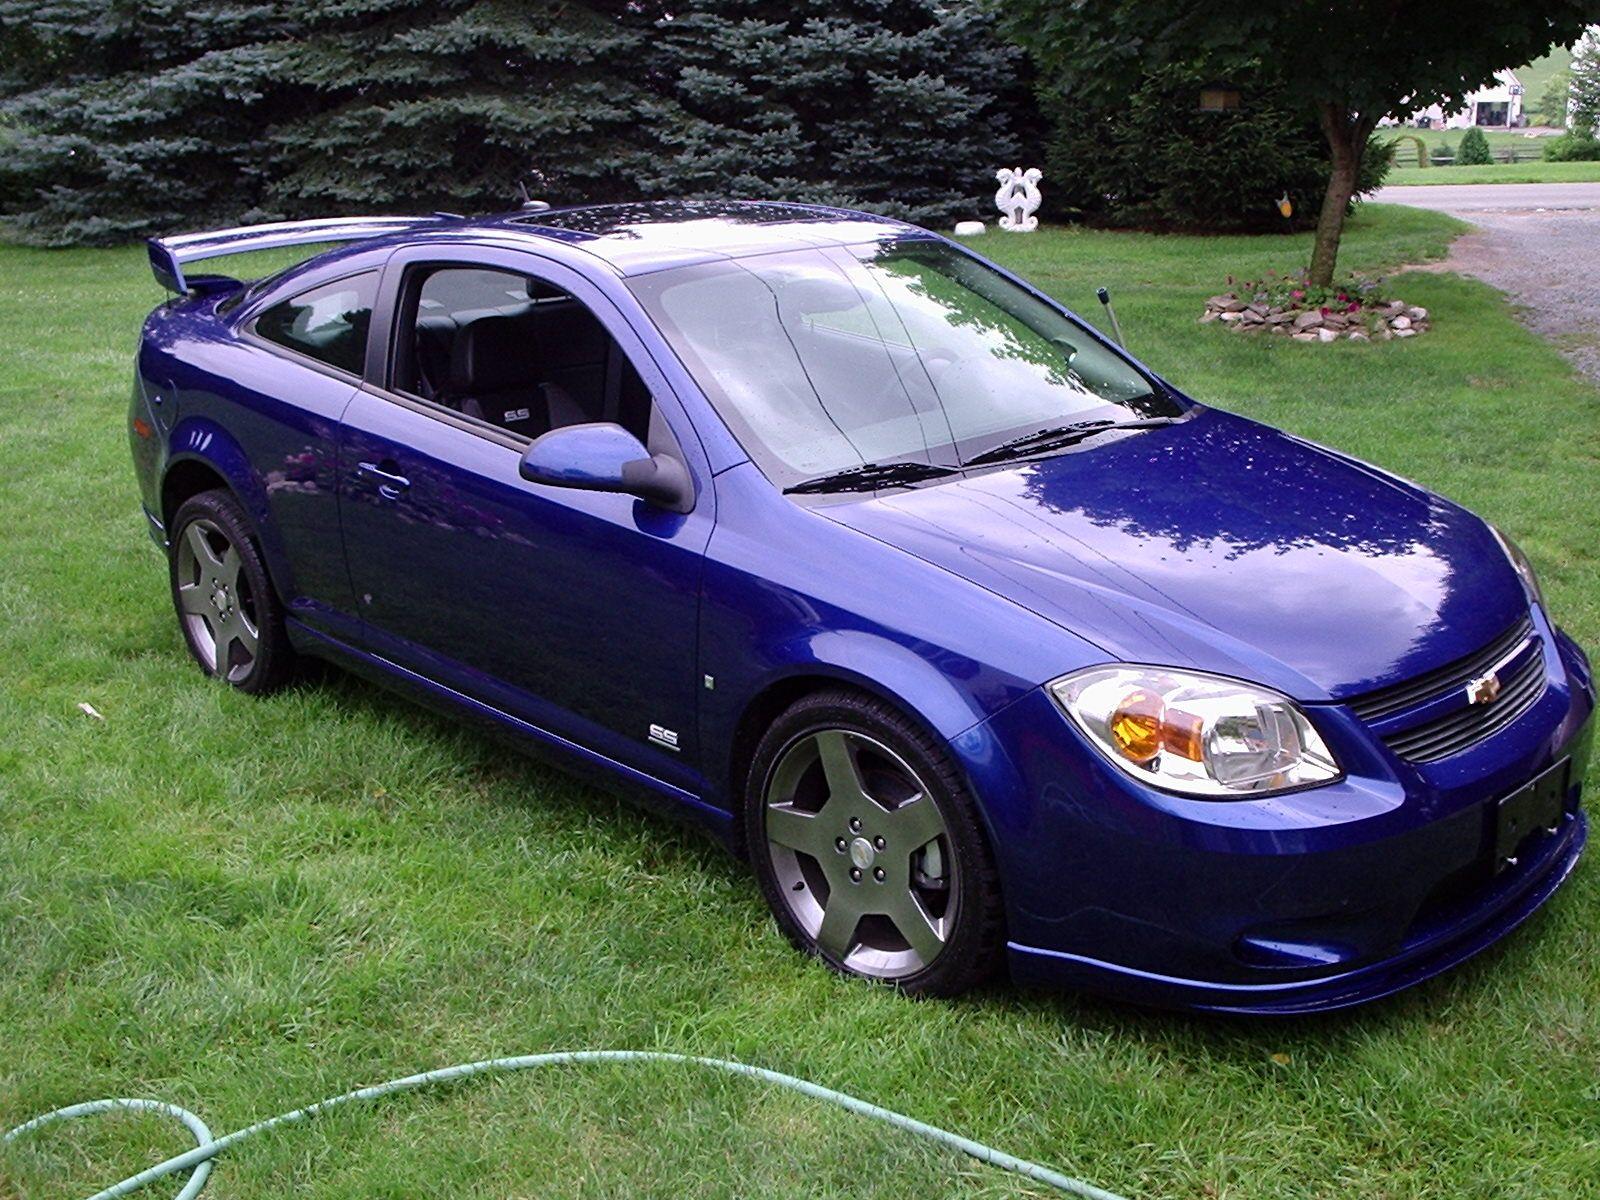 2008 cobalt ss specs - Blue Chevrolet